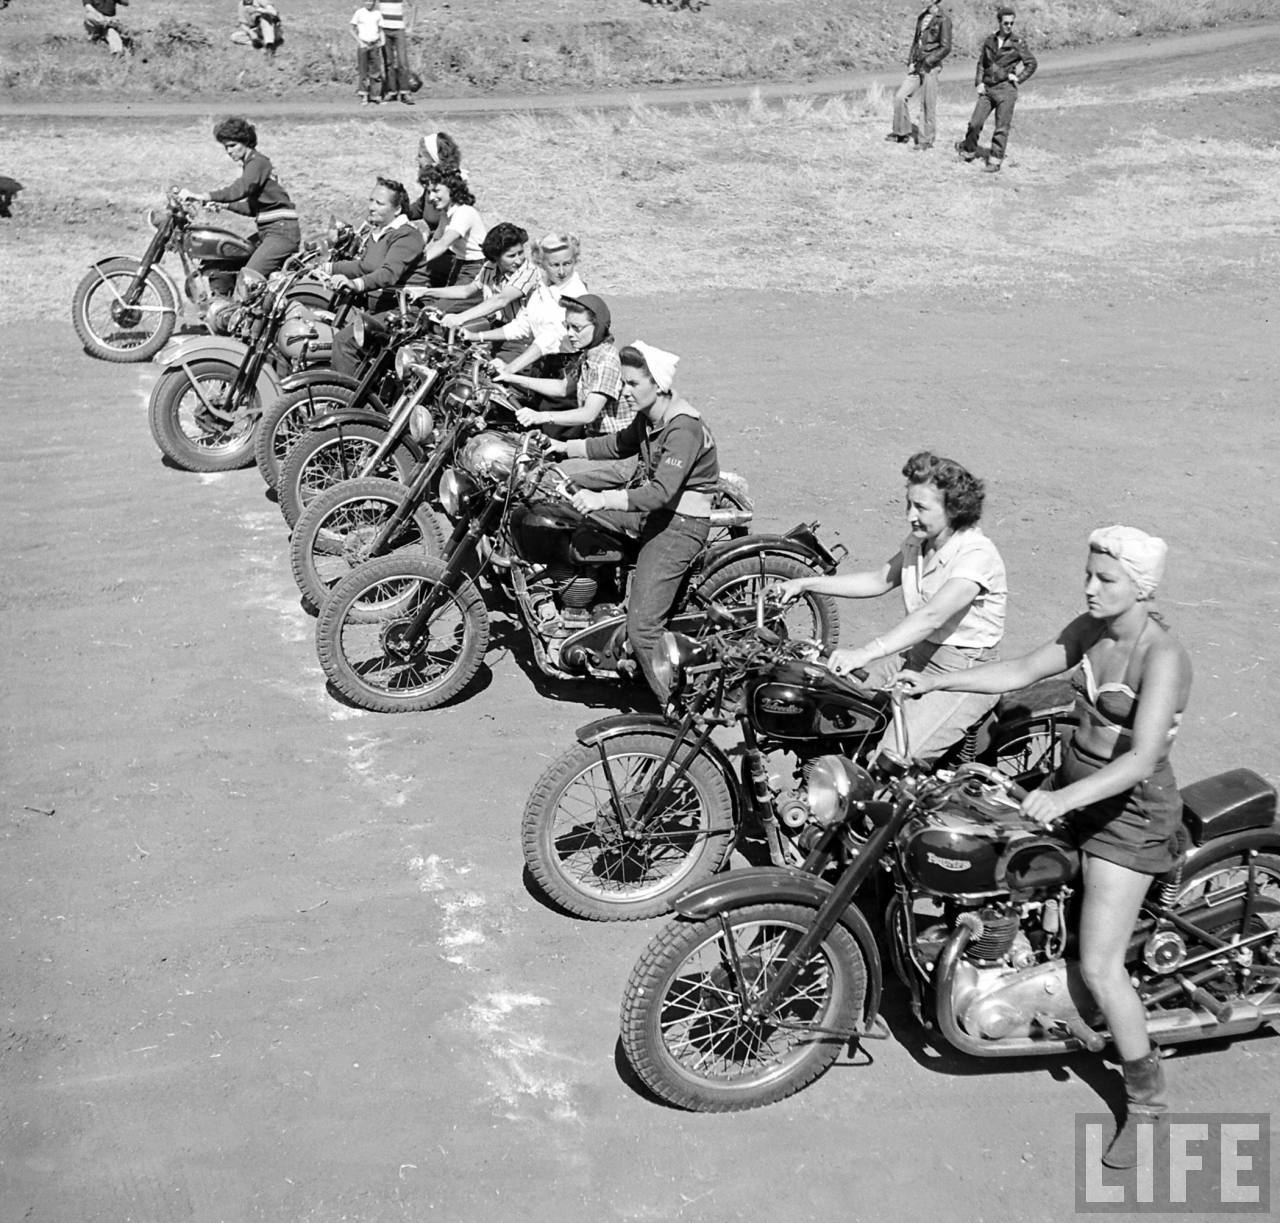 S Bike Girls Fascinating Photos Of Female